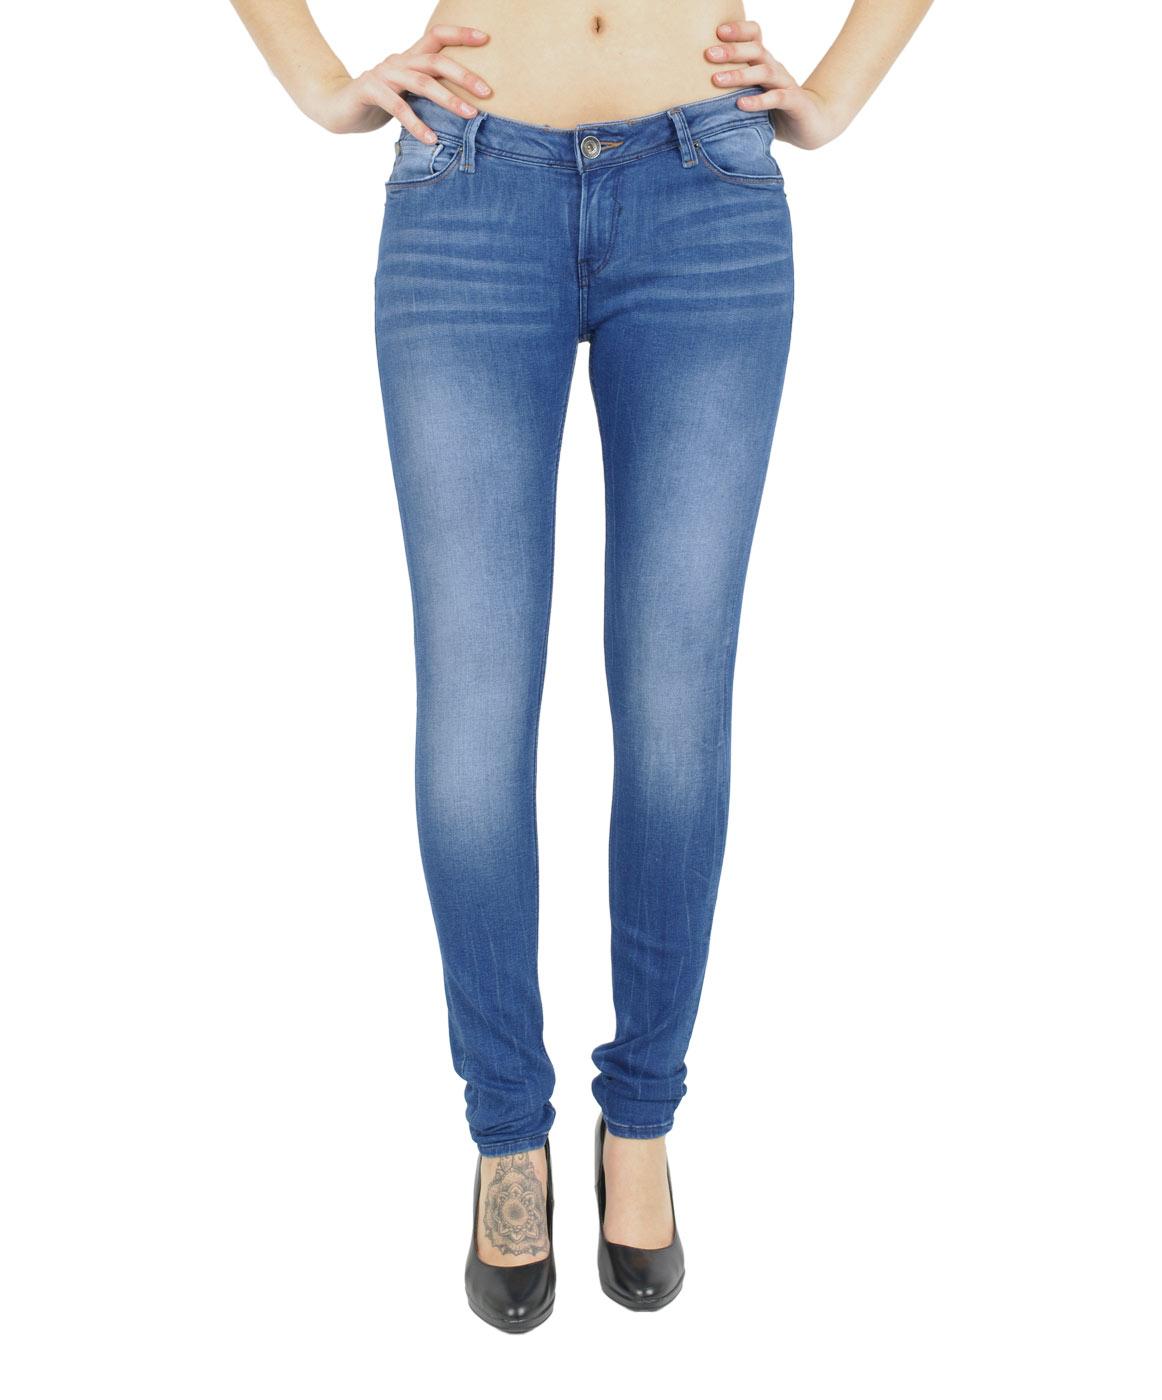 Hosen - Garcia Slim Fit Jeans Riva in Royal Blue Used  - Onlineshop Jeans Meile